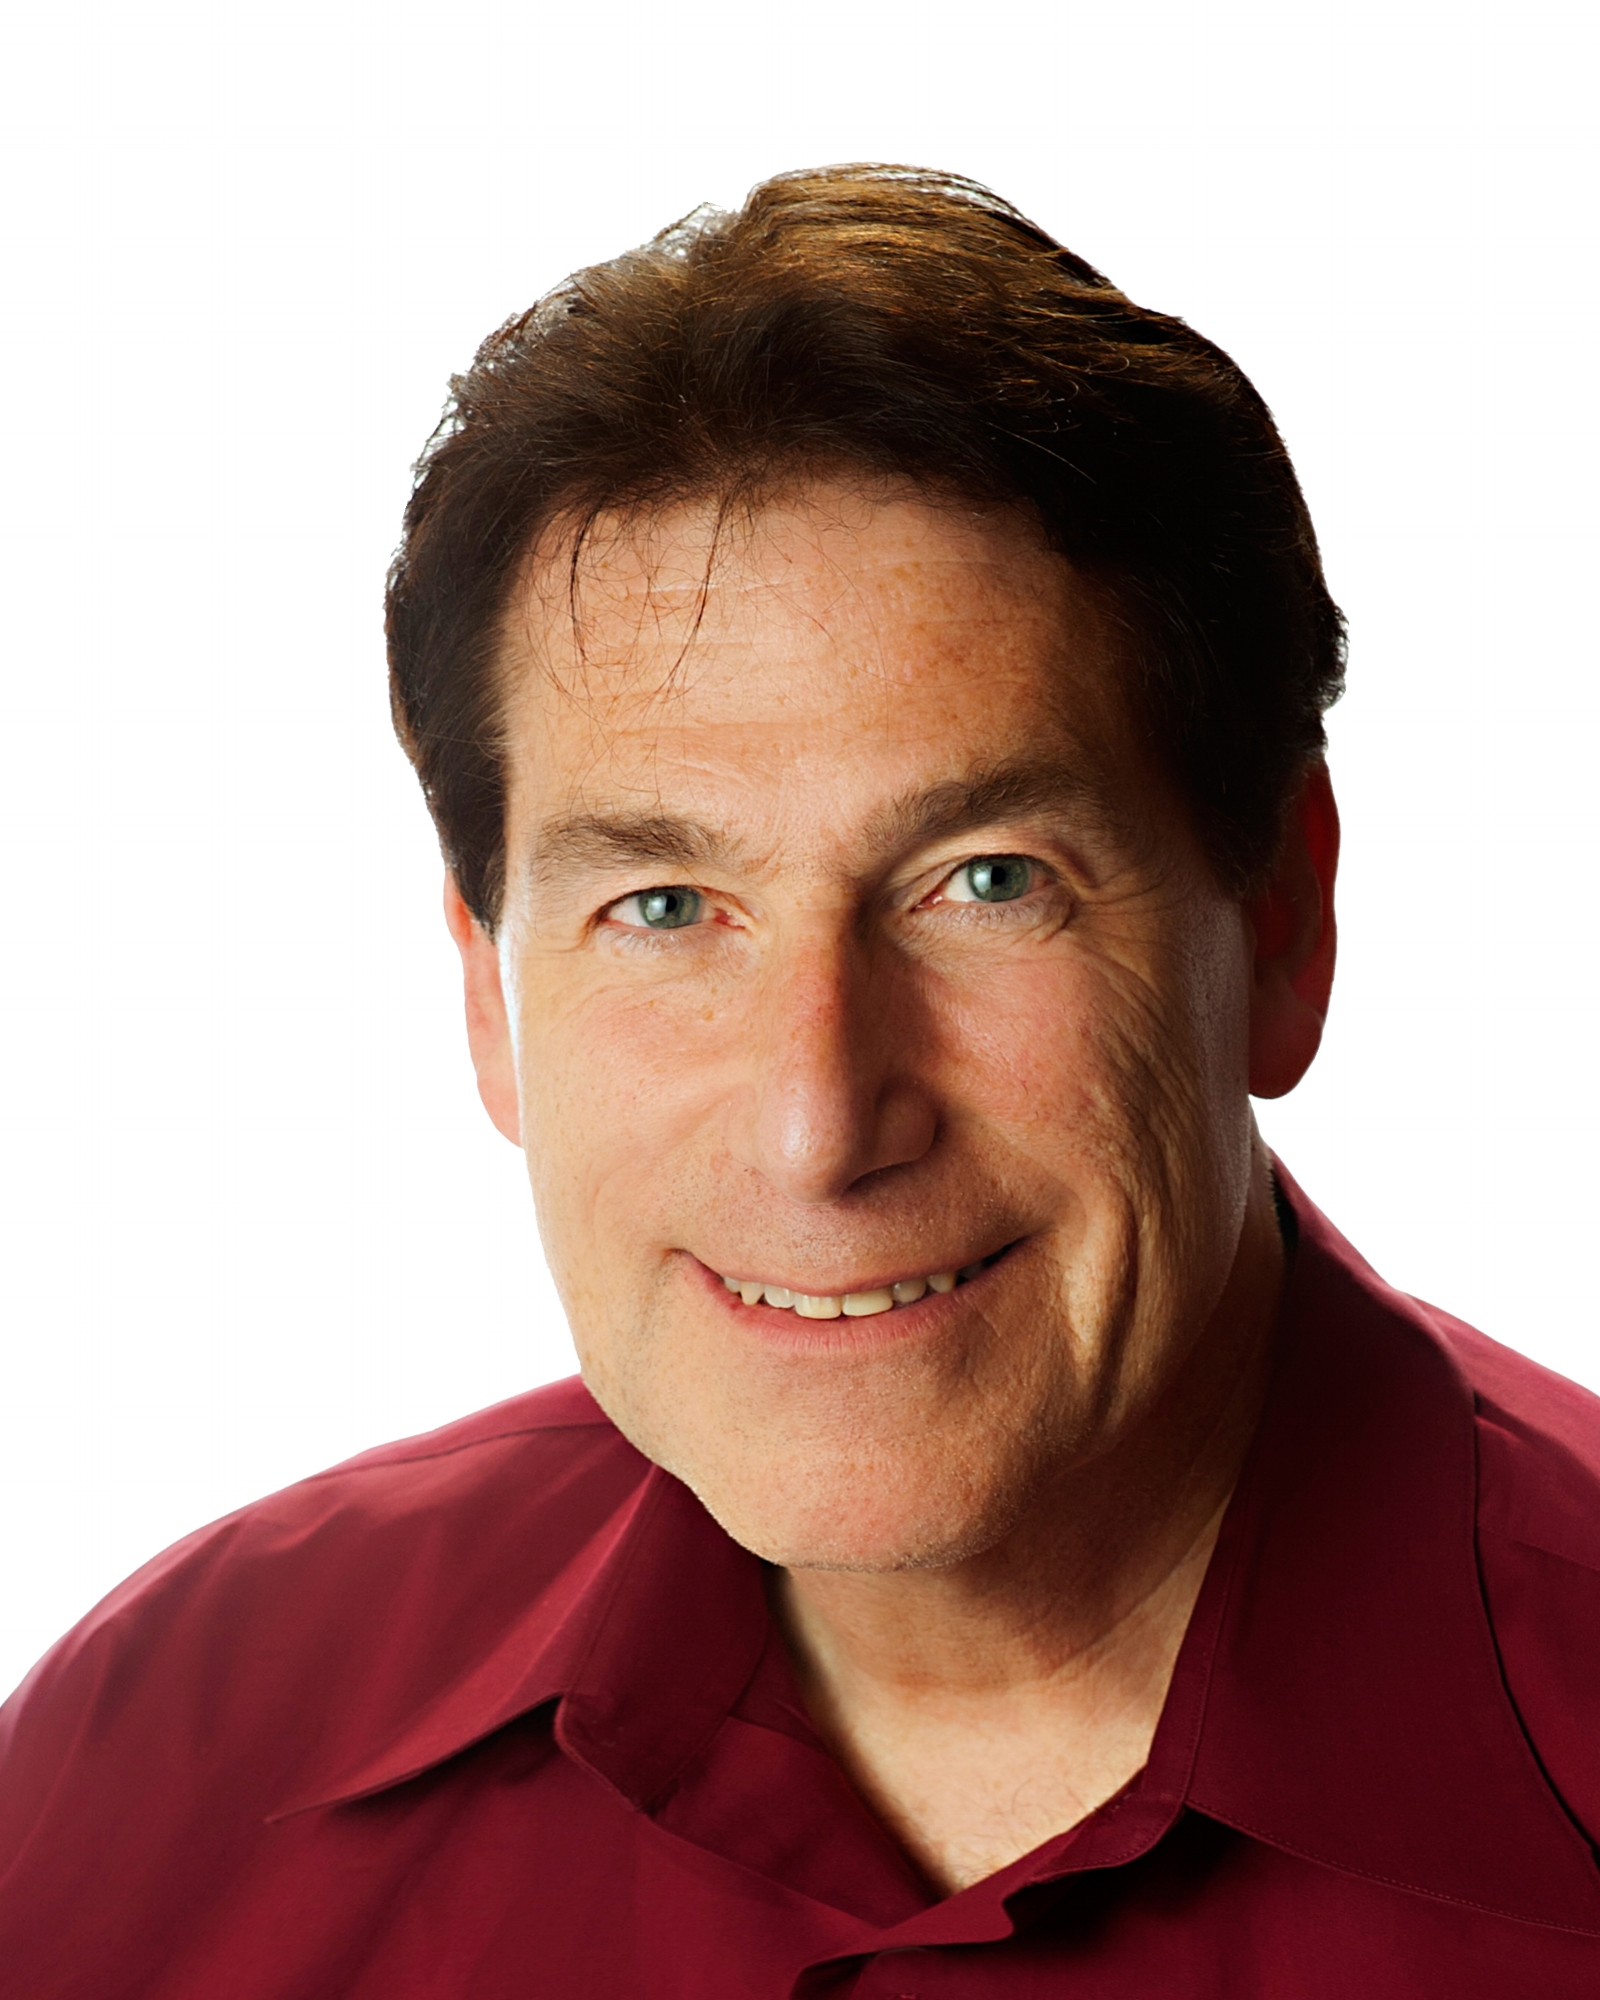 Jerry Bigpic